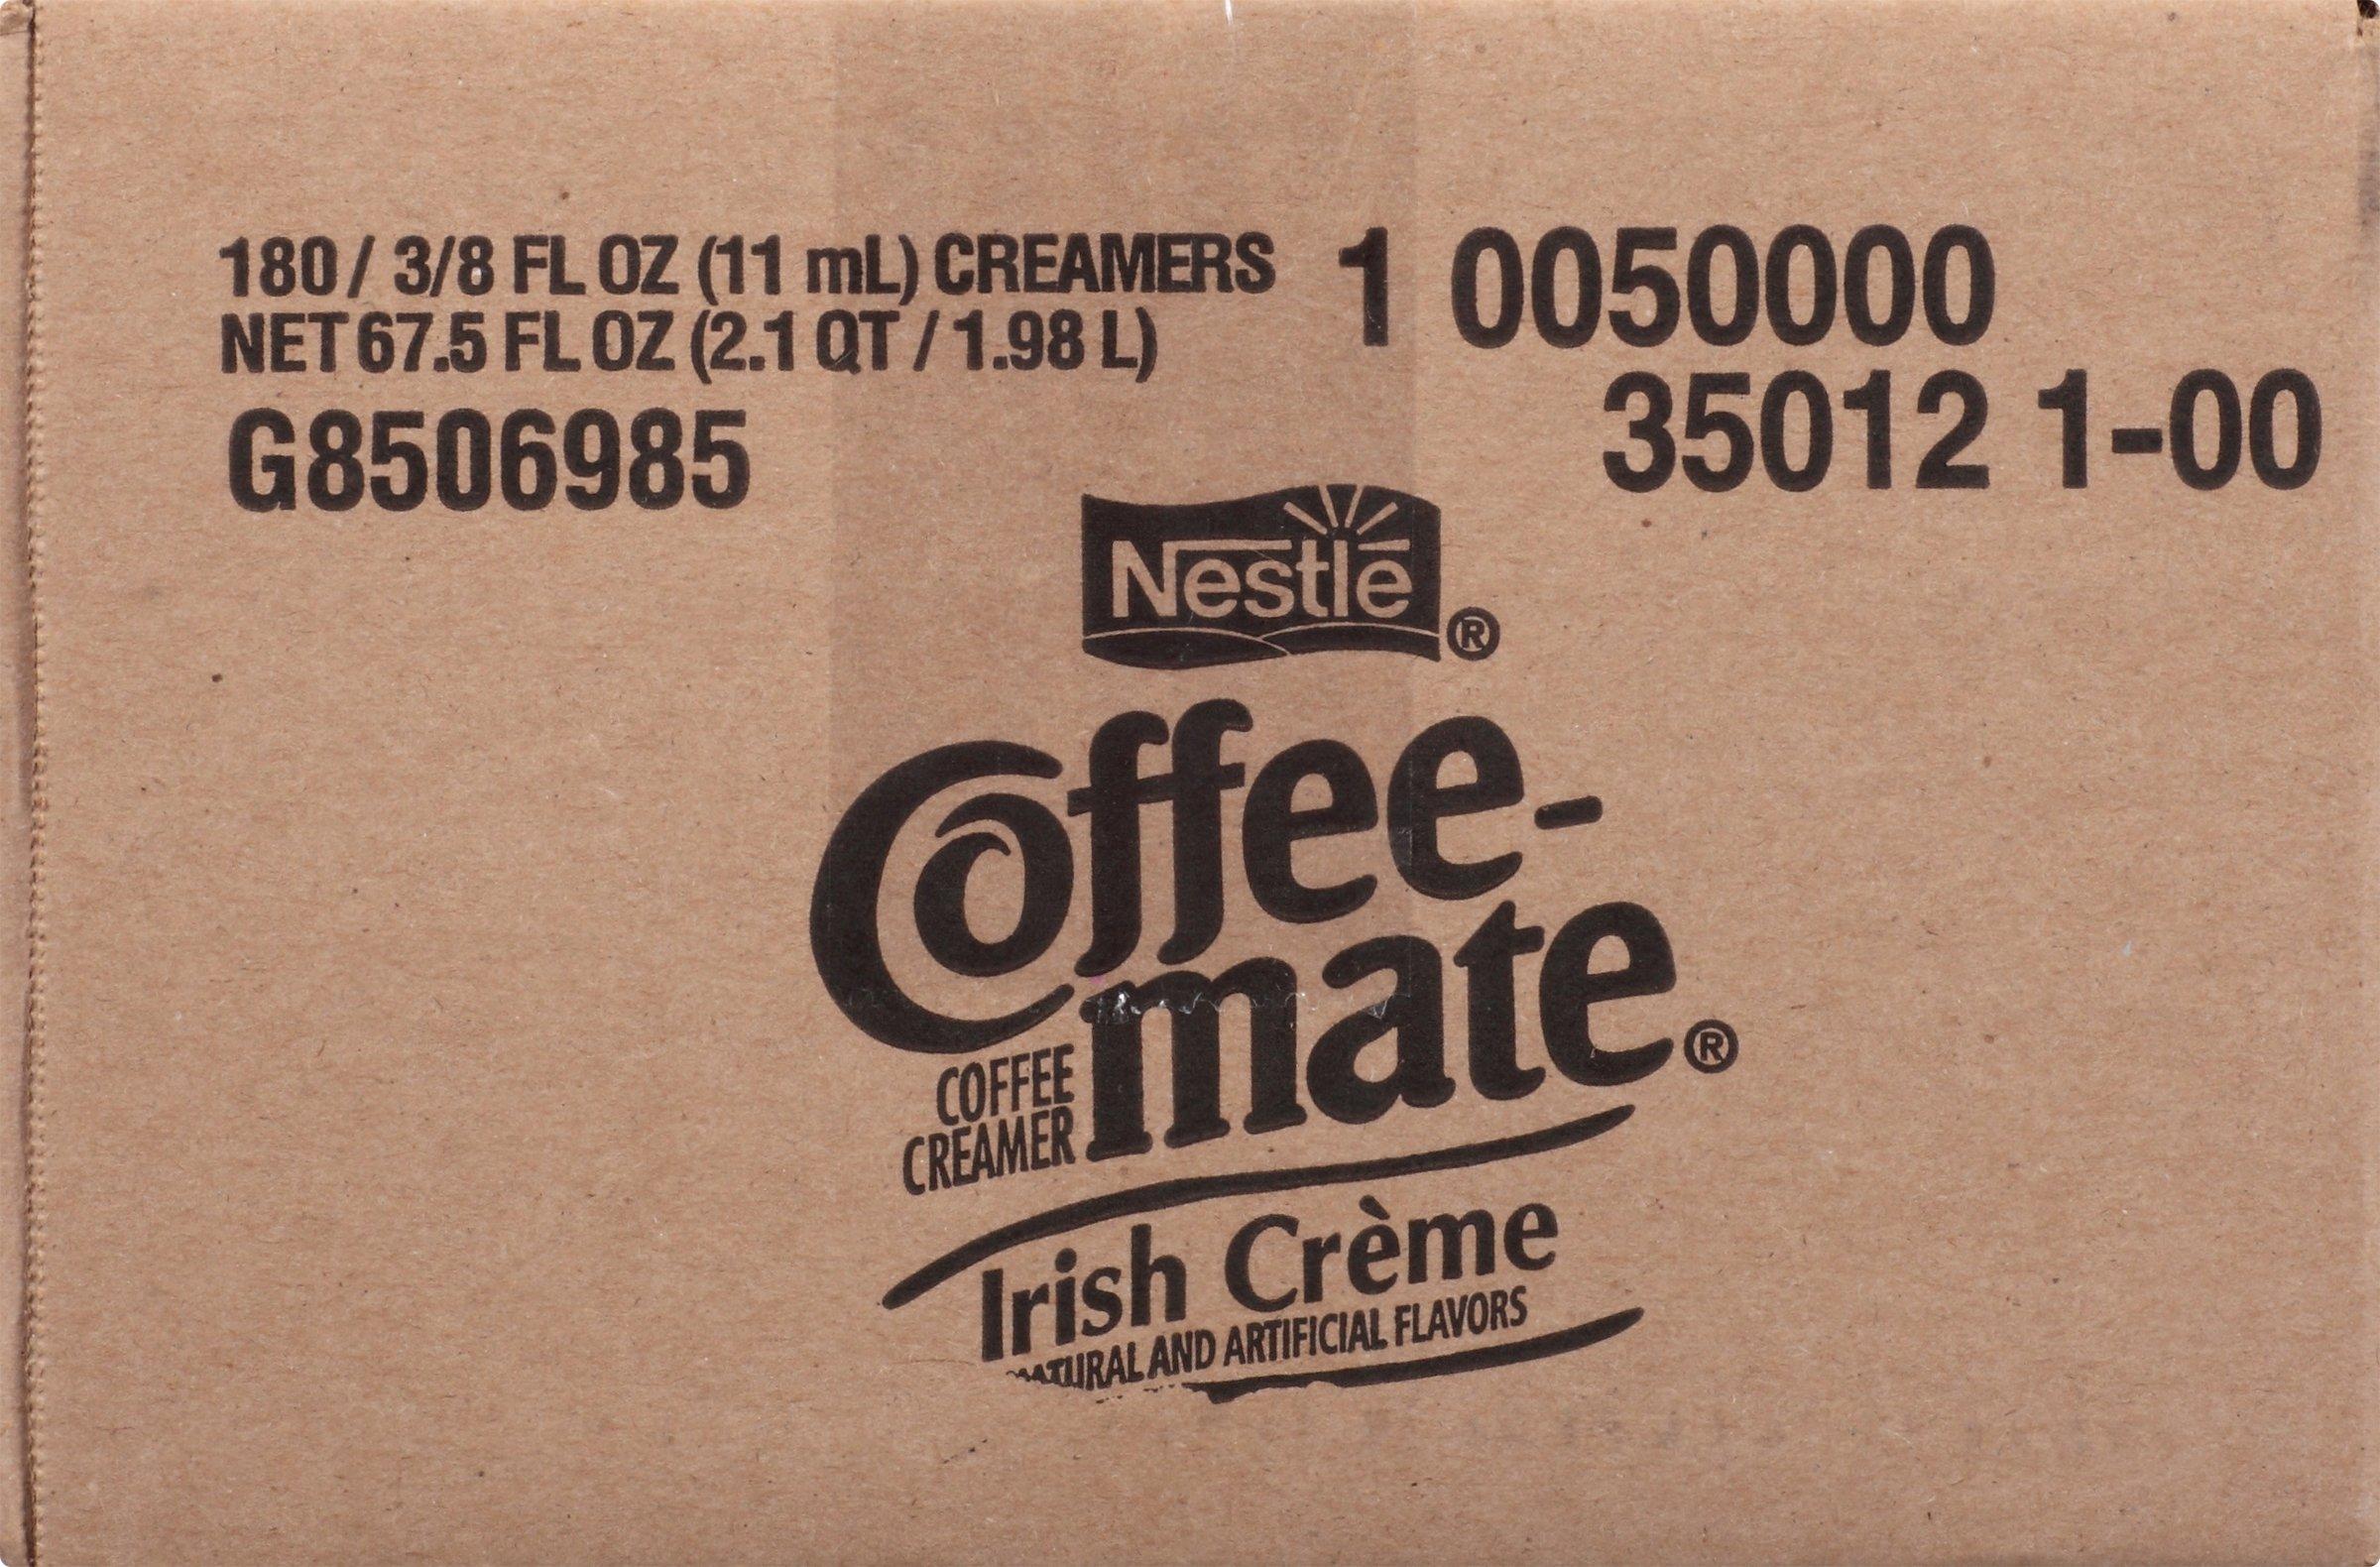 NESTLE COFFEE-MATE Coffee Creamer, Irish Creme, liquid creamer singles, 180 Count (Pack of 1) by Nestle Coffee Mate (Image #3)